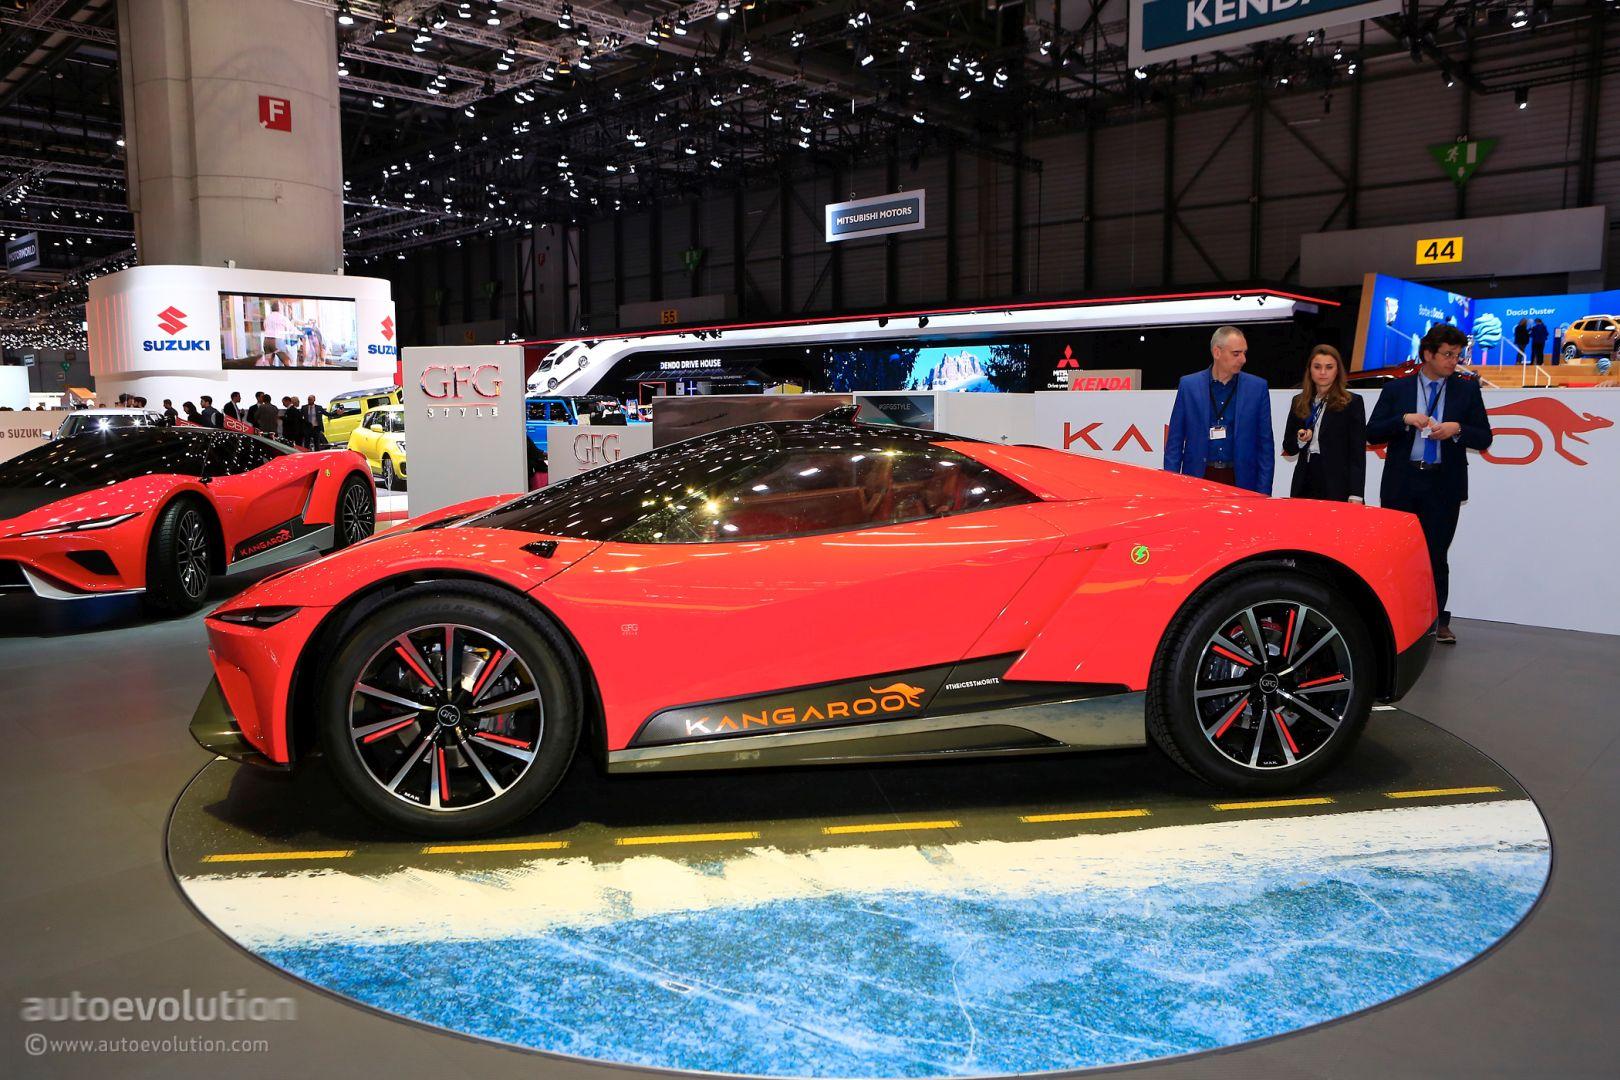 gfg style kangaroo is the jacked-up electric supercar we need